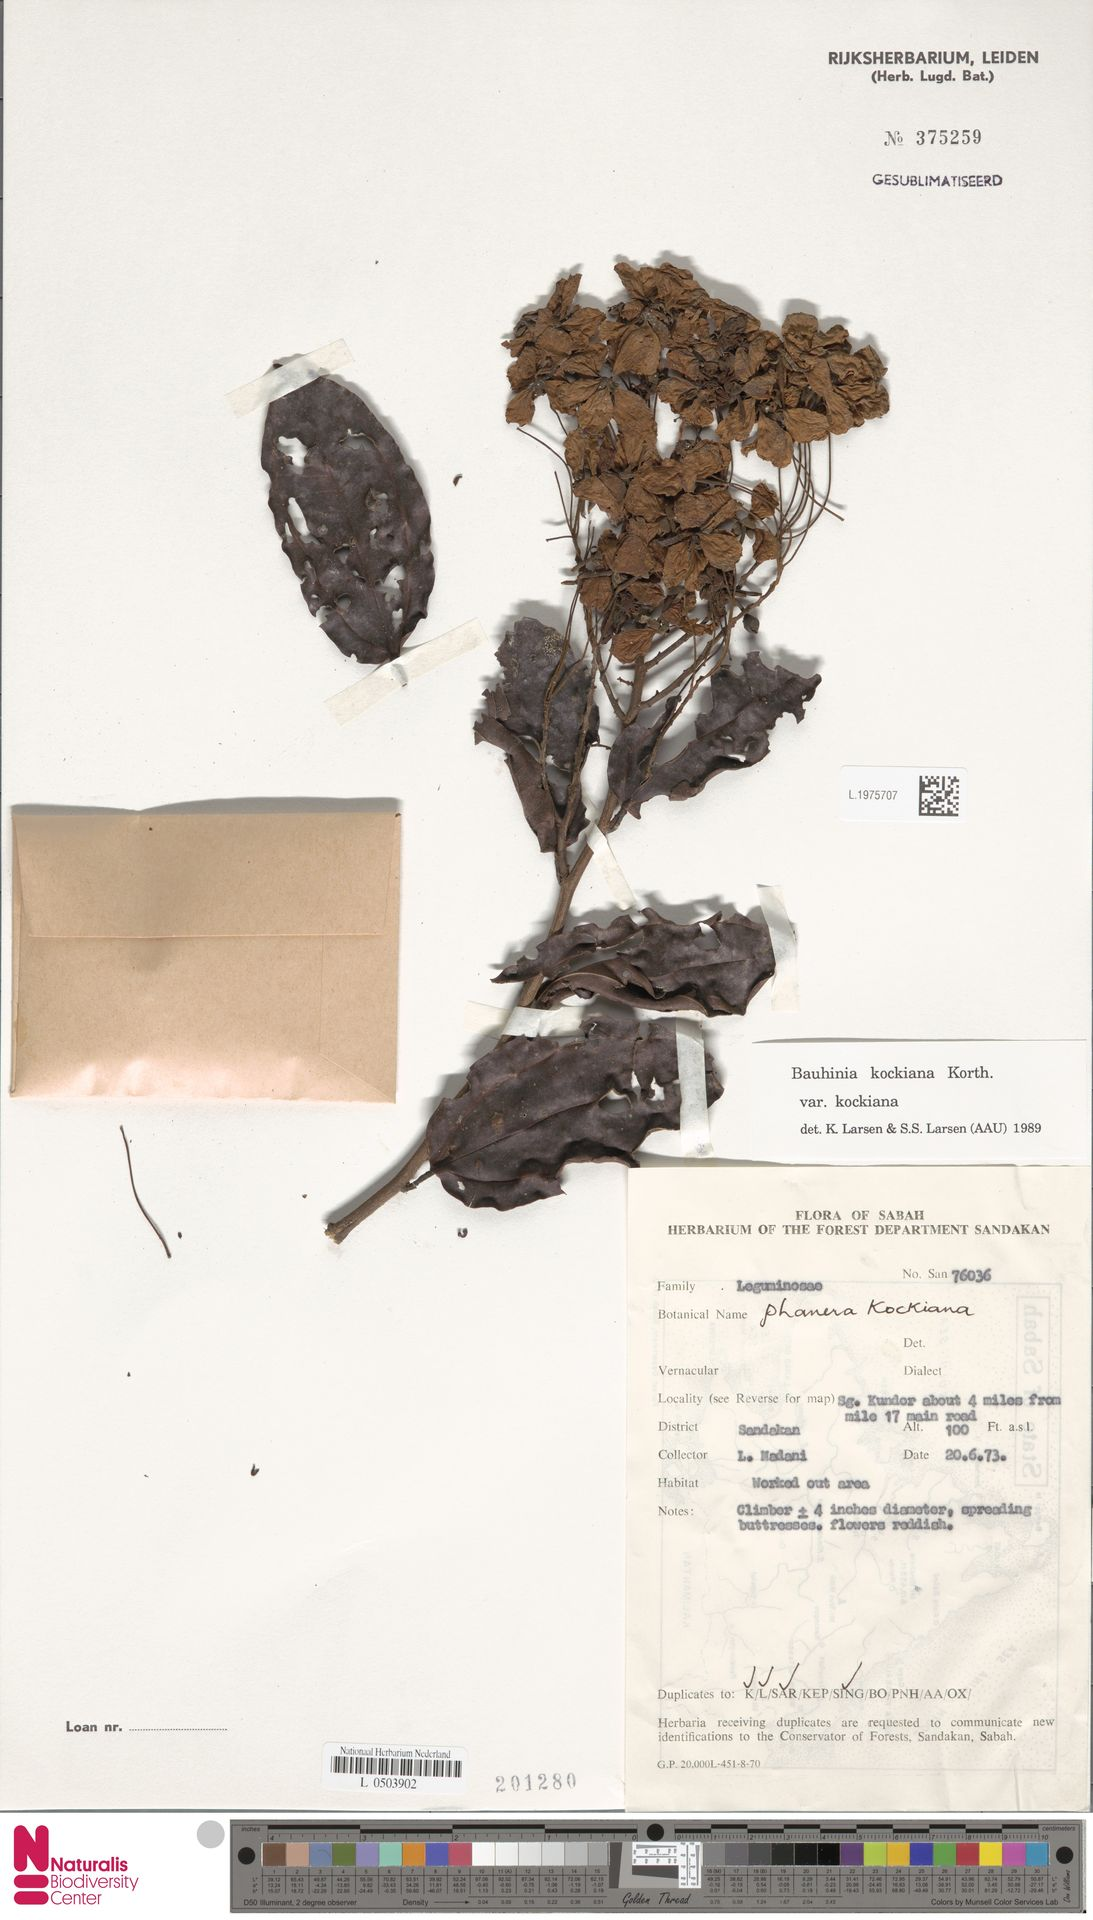 L.1975707 | Bauhinia kockiana var. kockiana